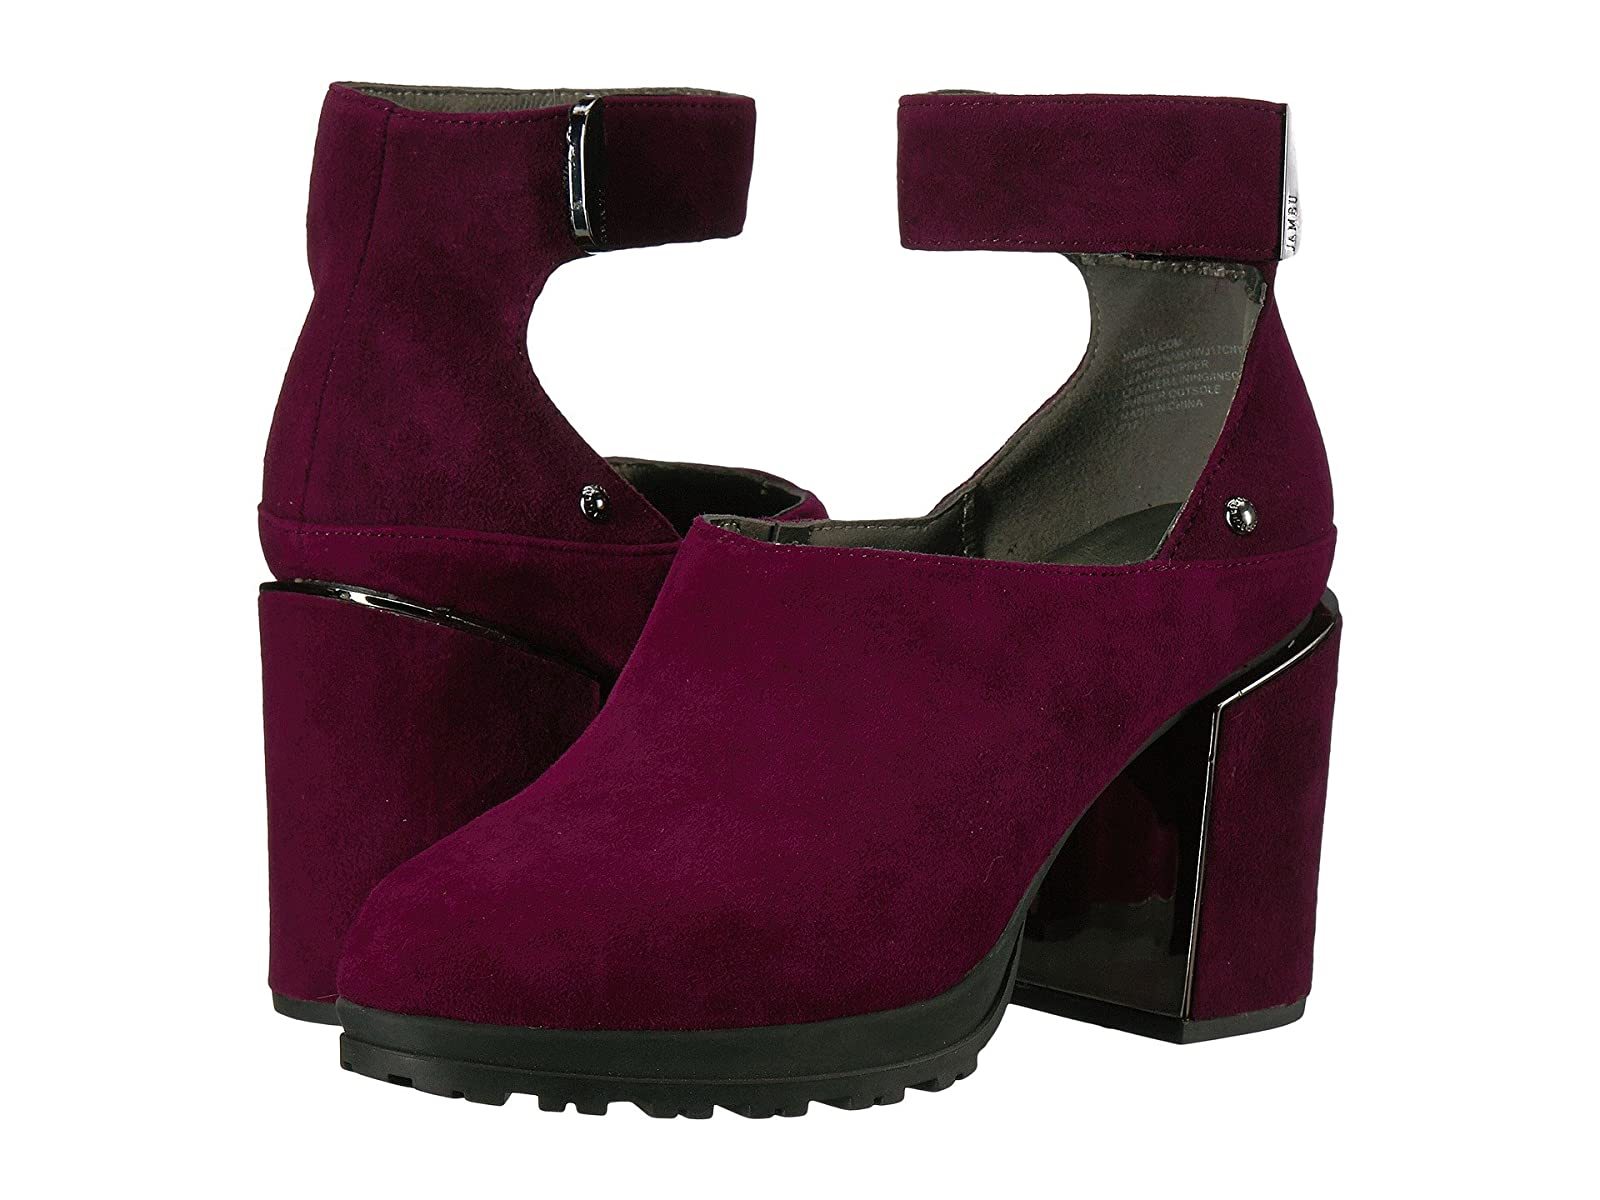 Jambu CanaryCheap and distinctive eye-catching shoes